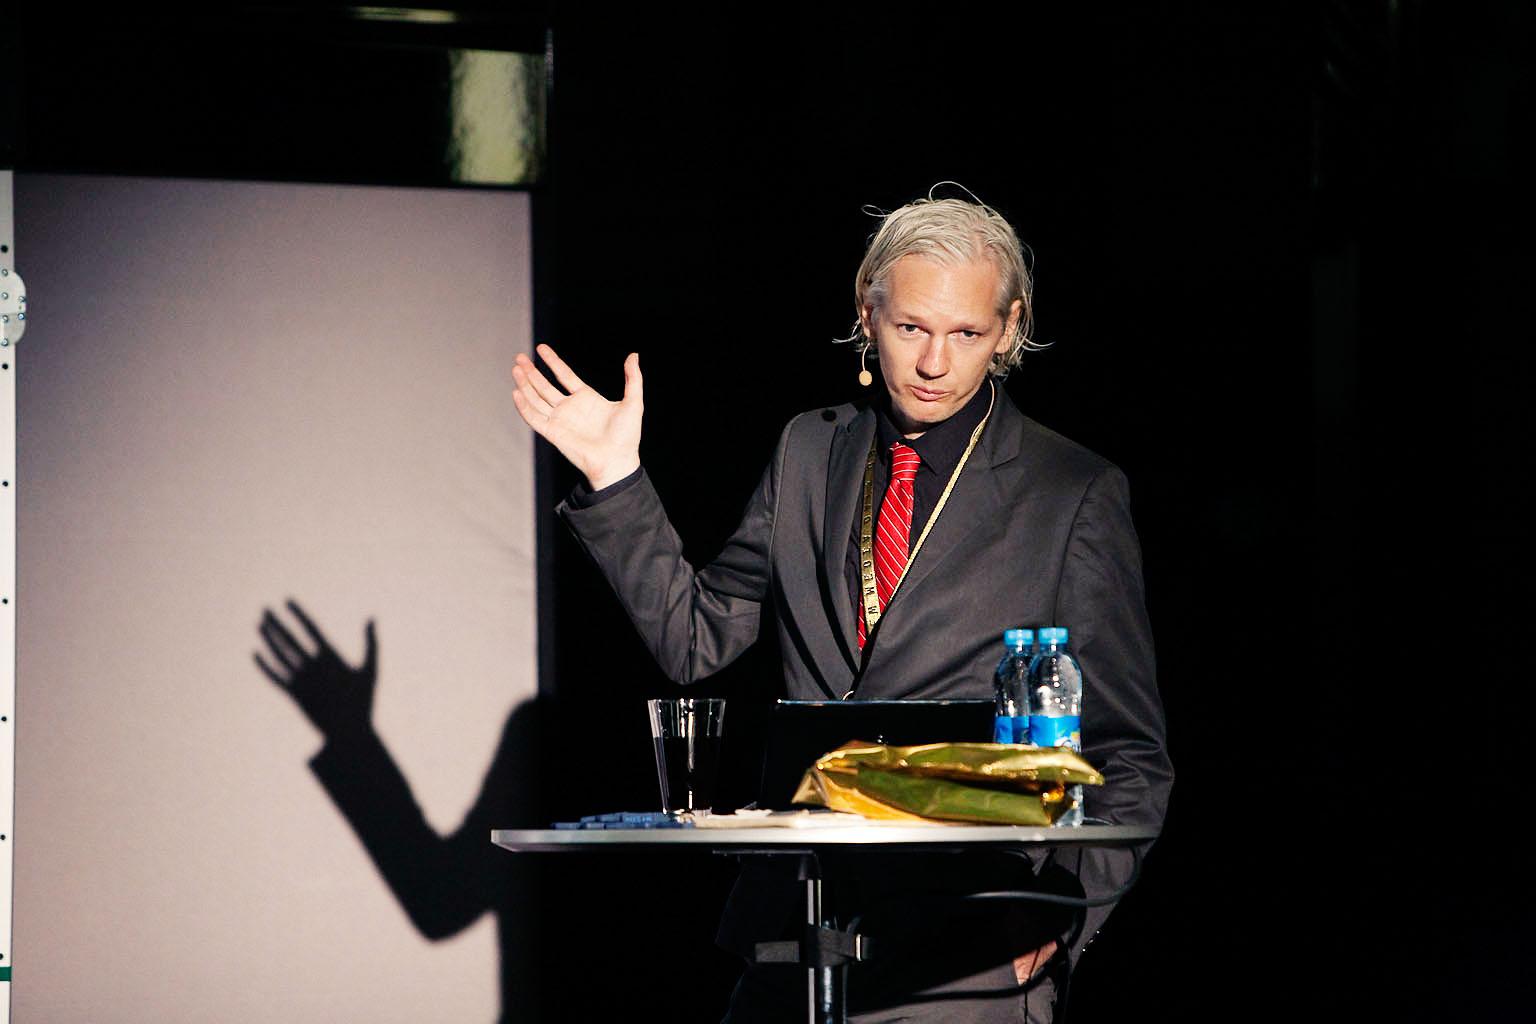 "ג'וליאן אסאנג', ראש הארגון ""ויקיליקס"" (צילום: New Media Days, רישיון cc-by-sa 3.0)"